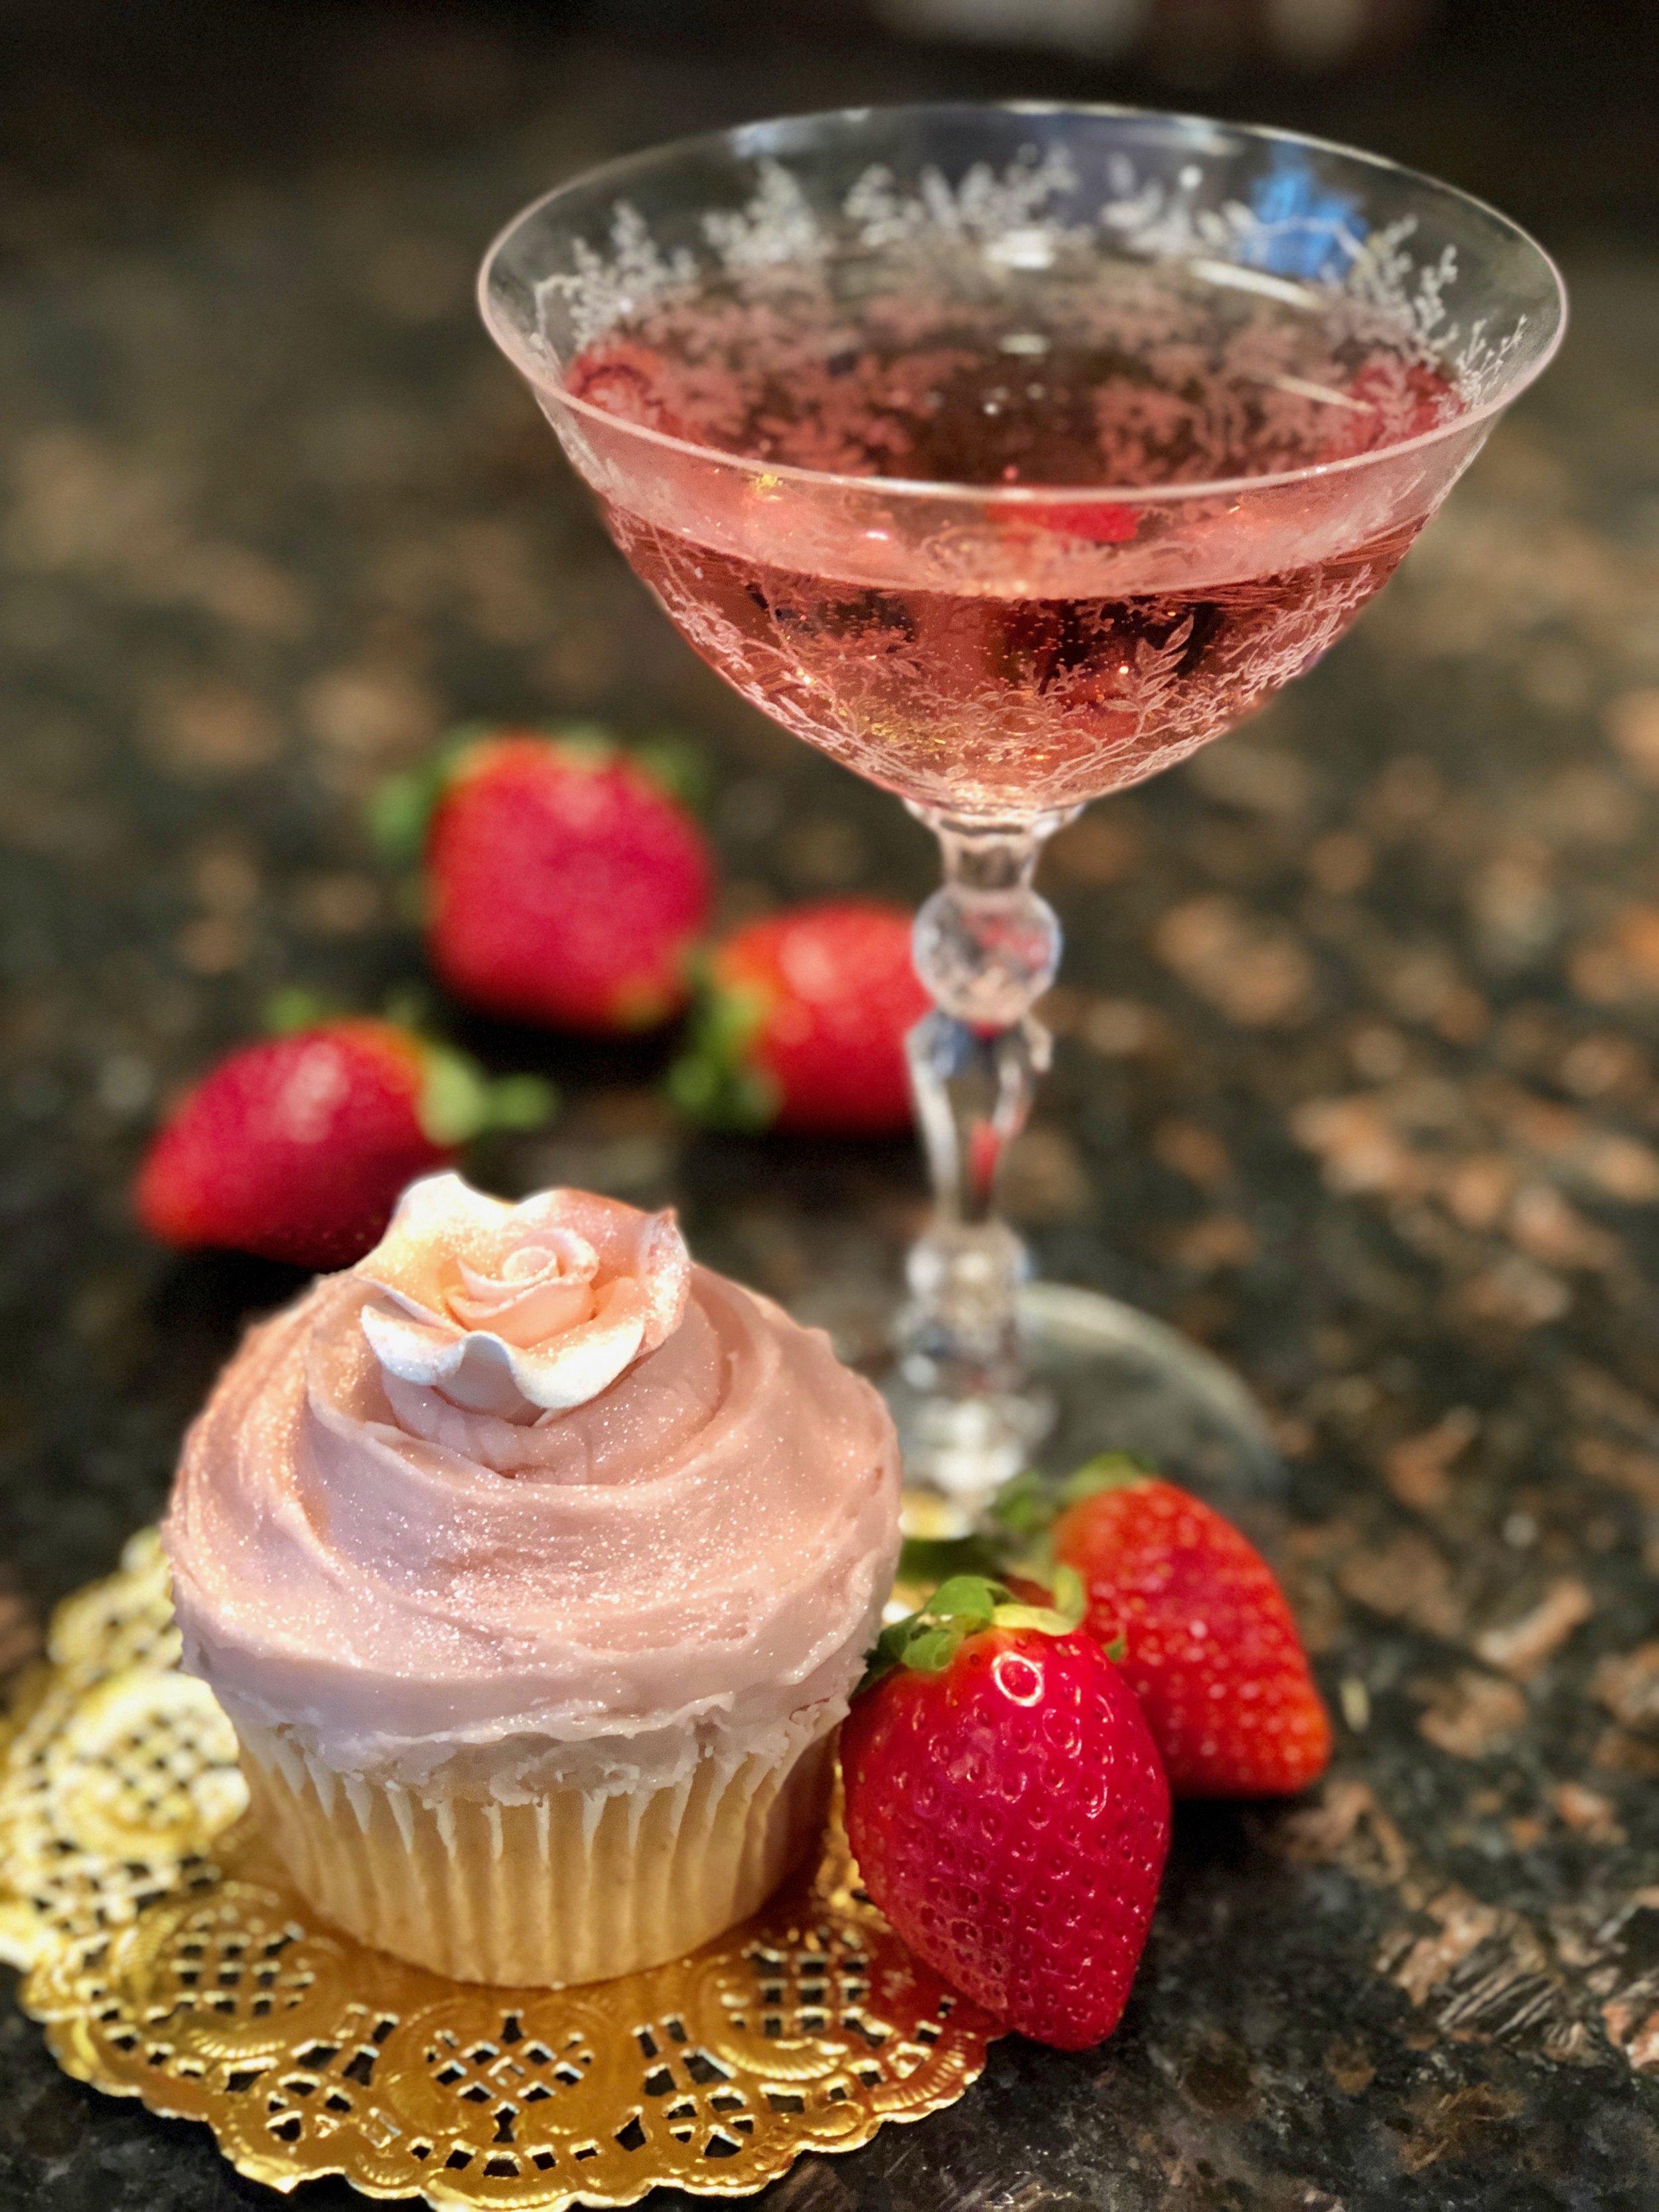 Champagne cupcake recipe and pink Champagne .jpg